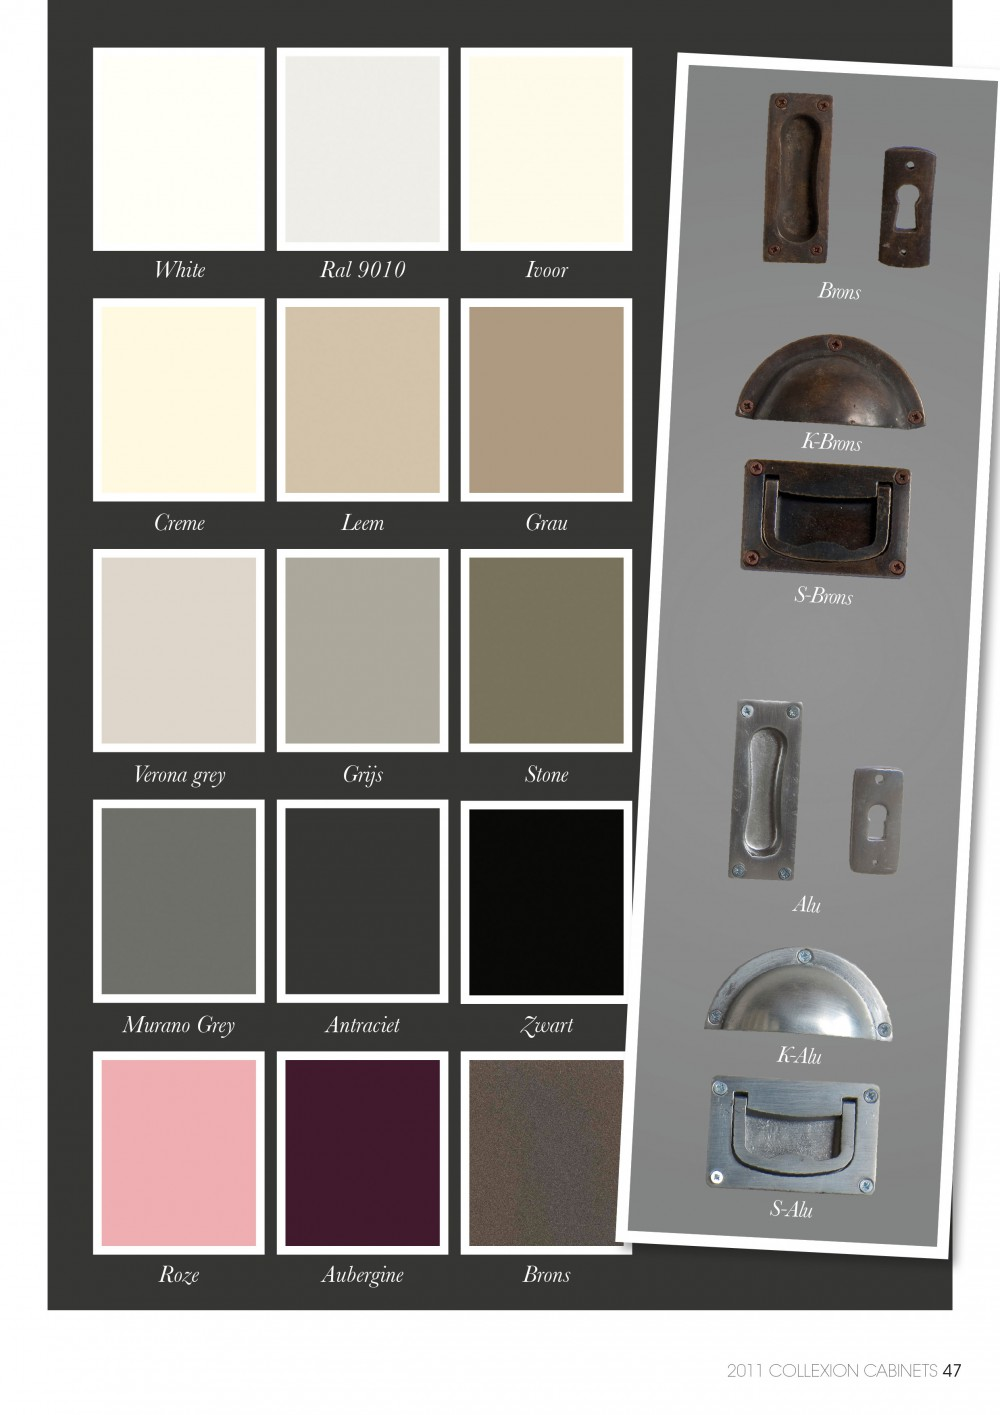 Sideboard Grau Holz Anrichte Grau Im Landhausstil Sideboard